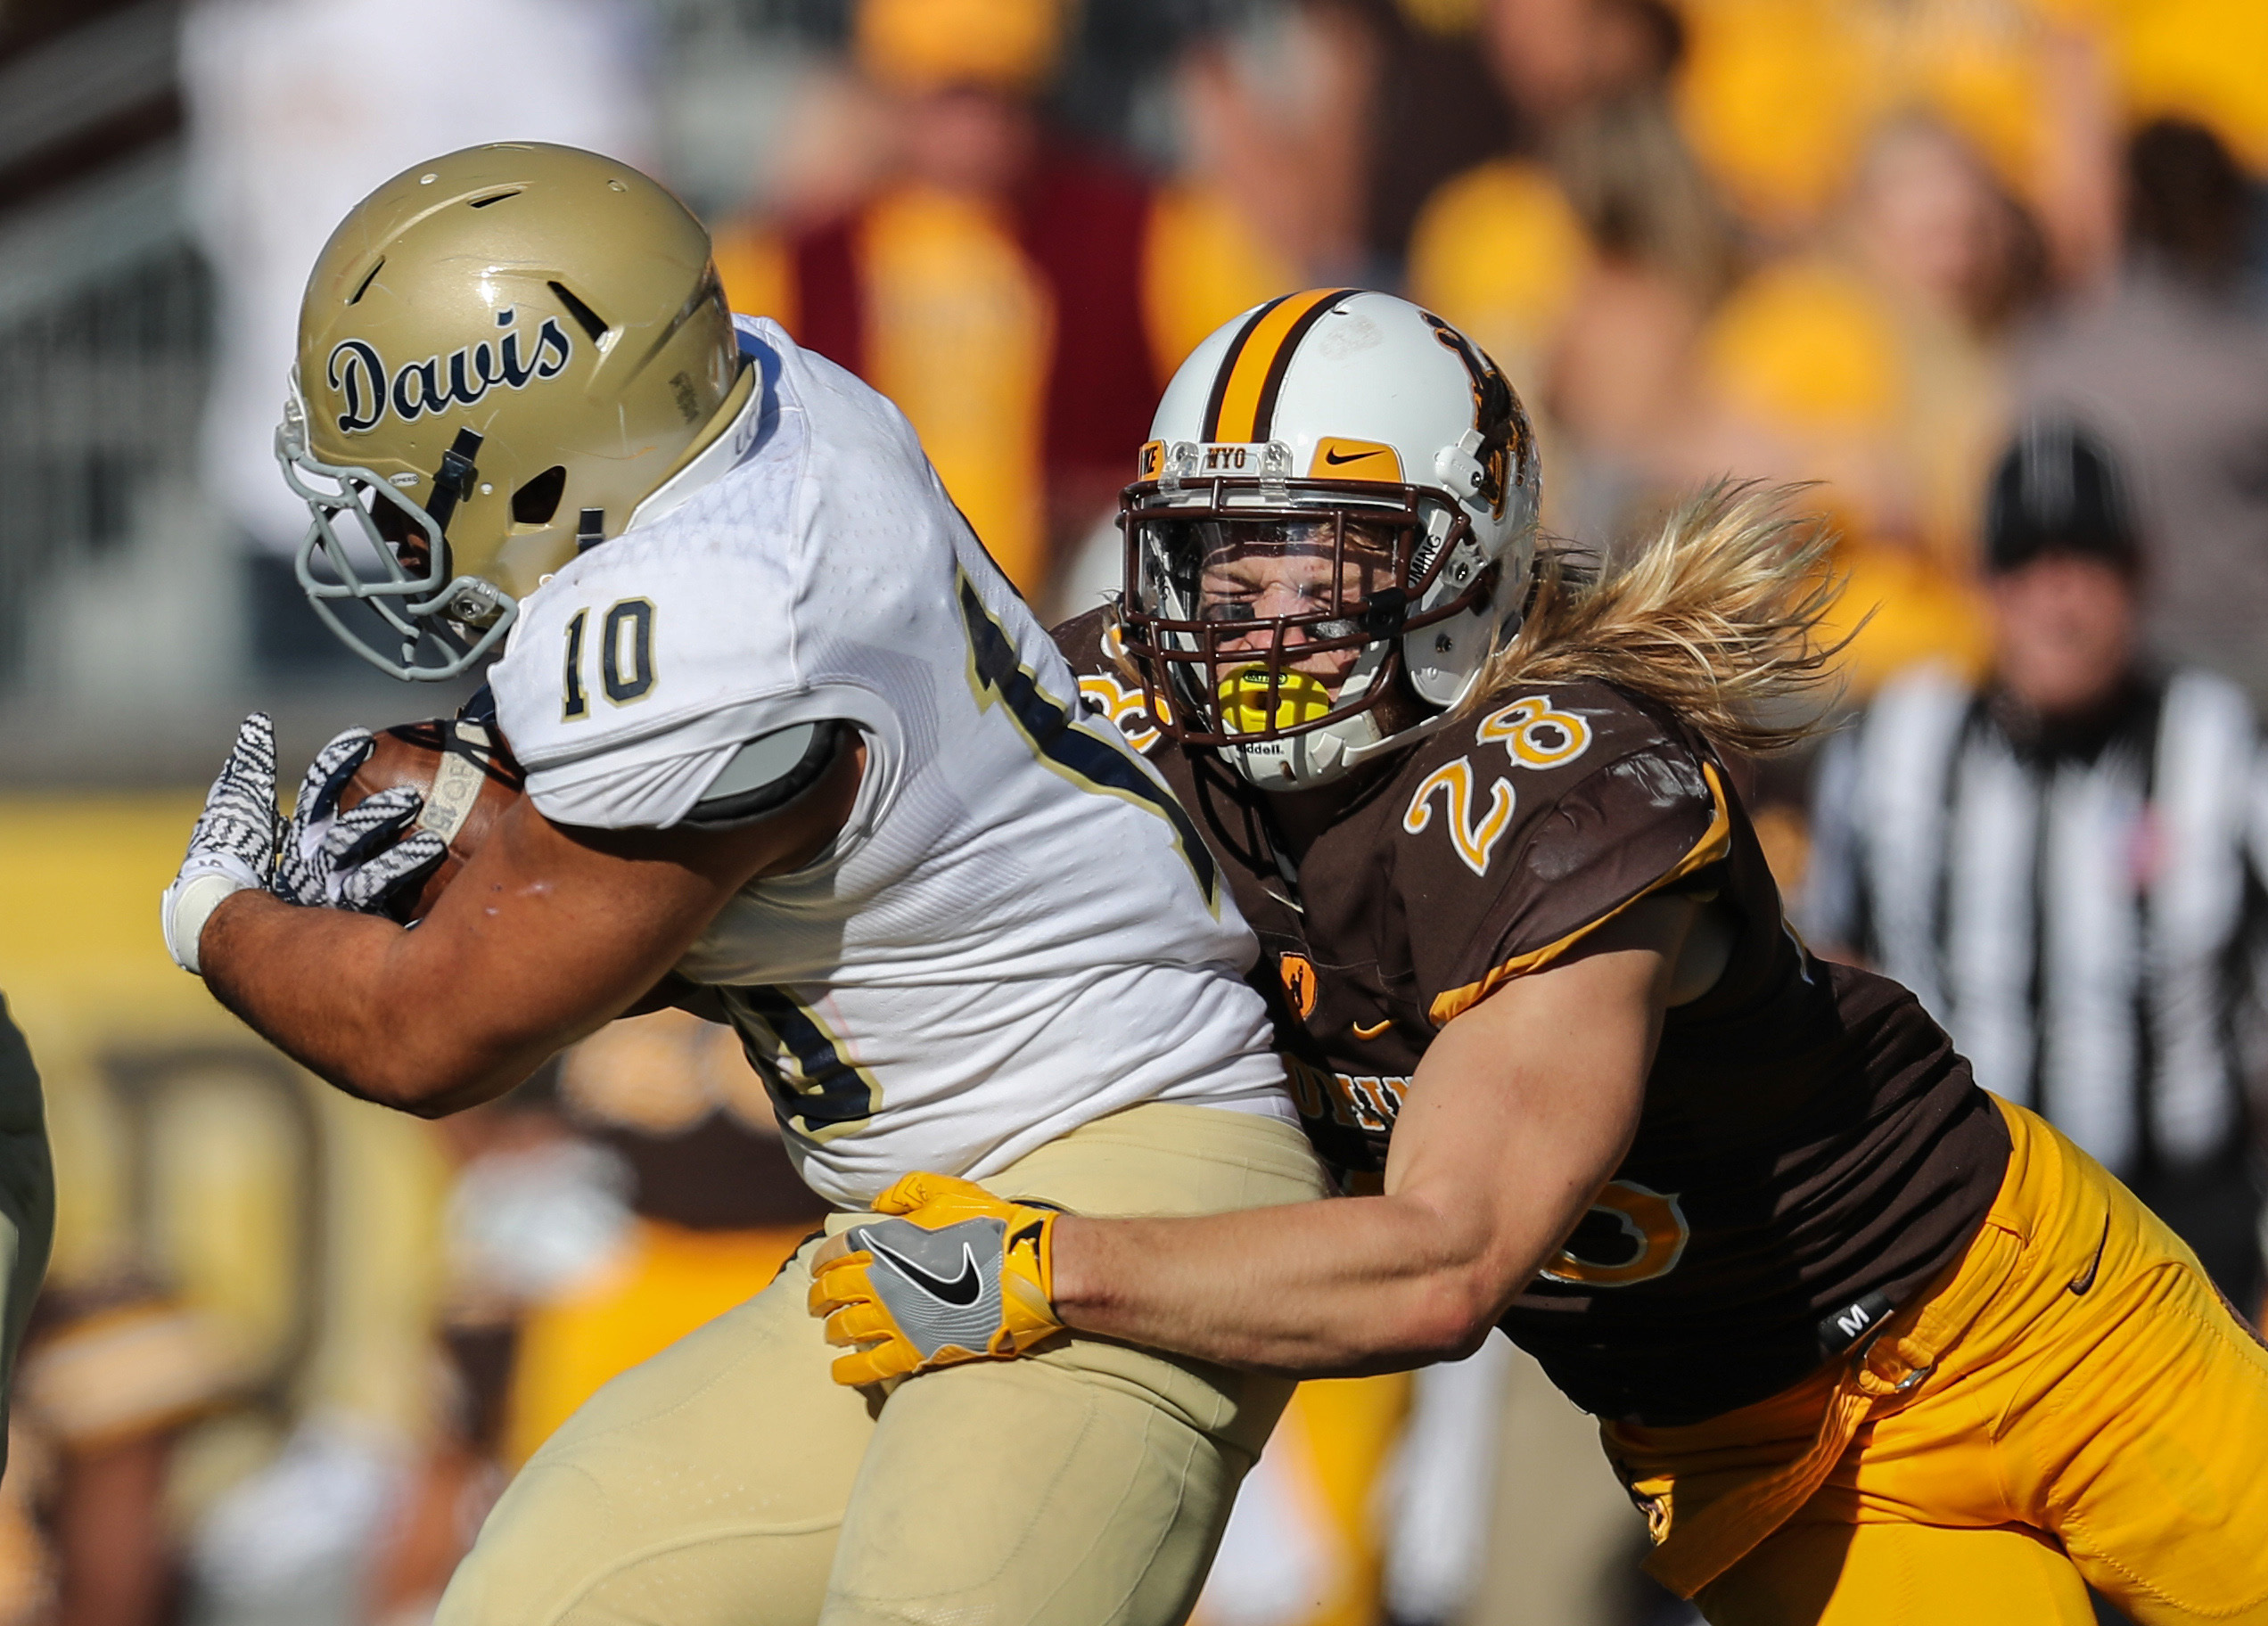 NCAA Football: UC - Davis at Wyoming